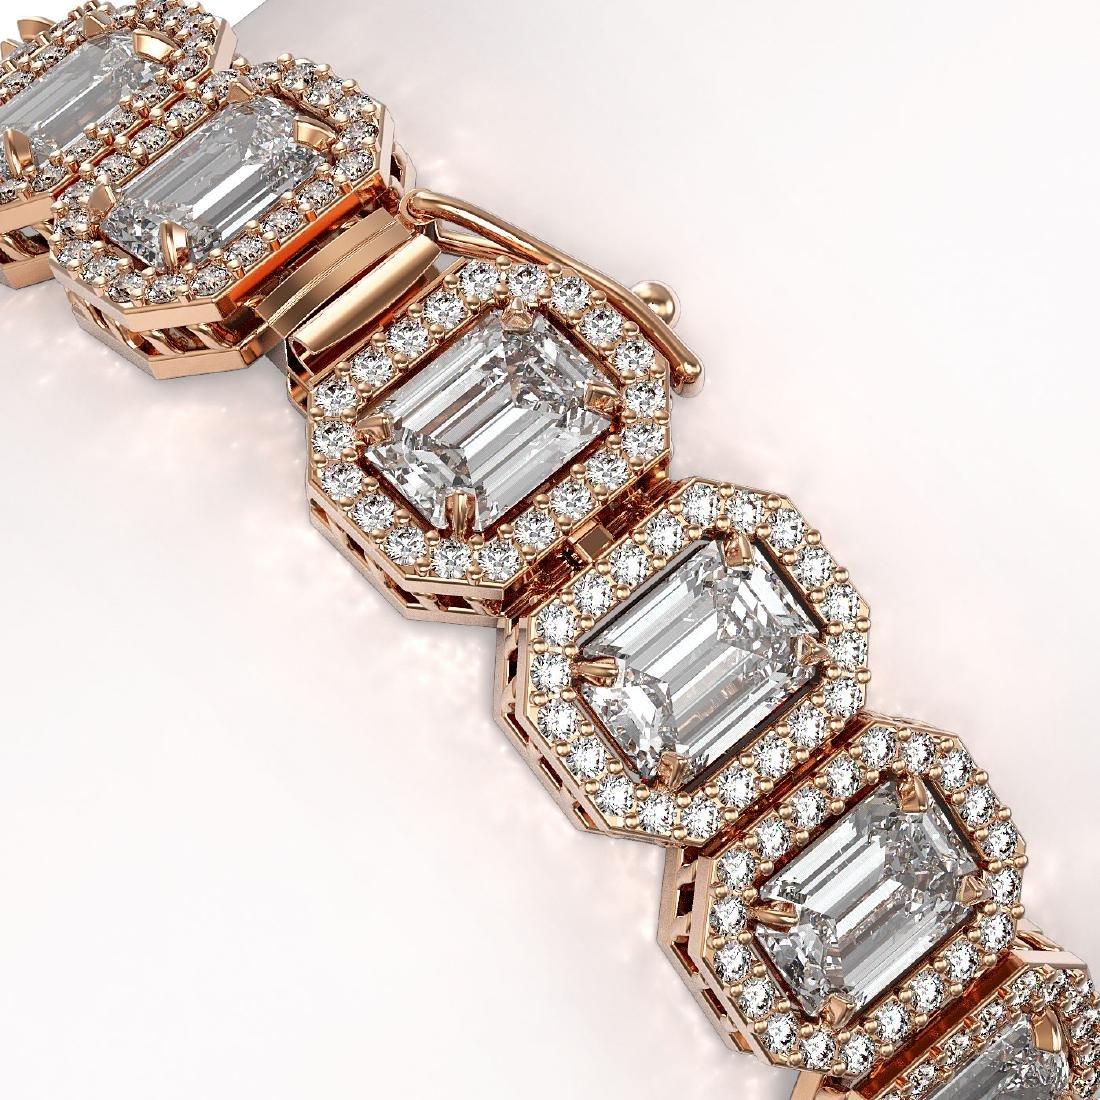 20.25 CTW Emerald Cut Diamond Designer Bracelet 18K - 3